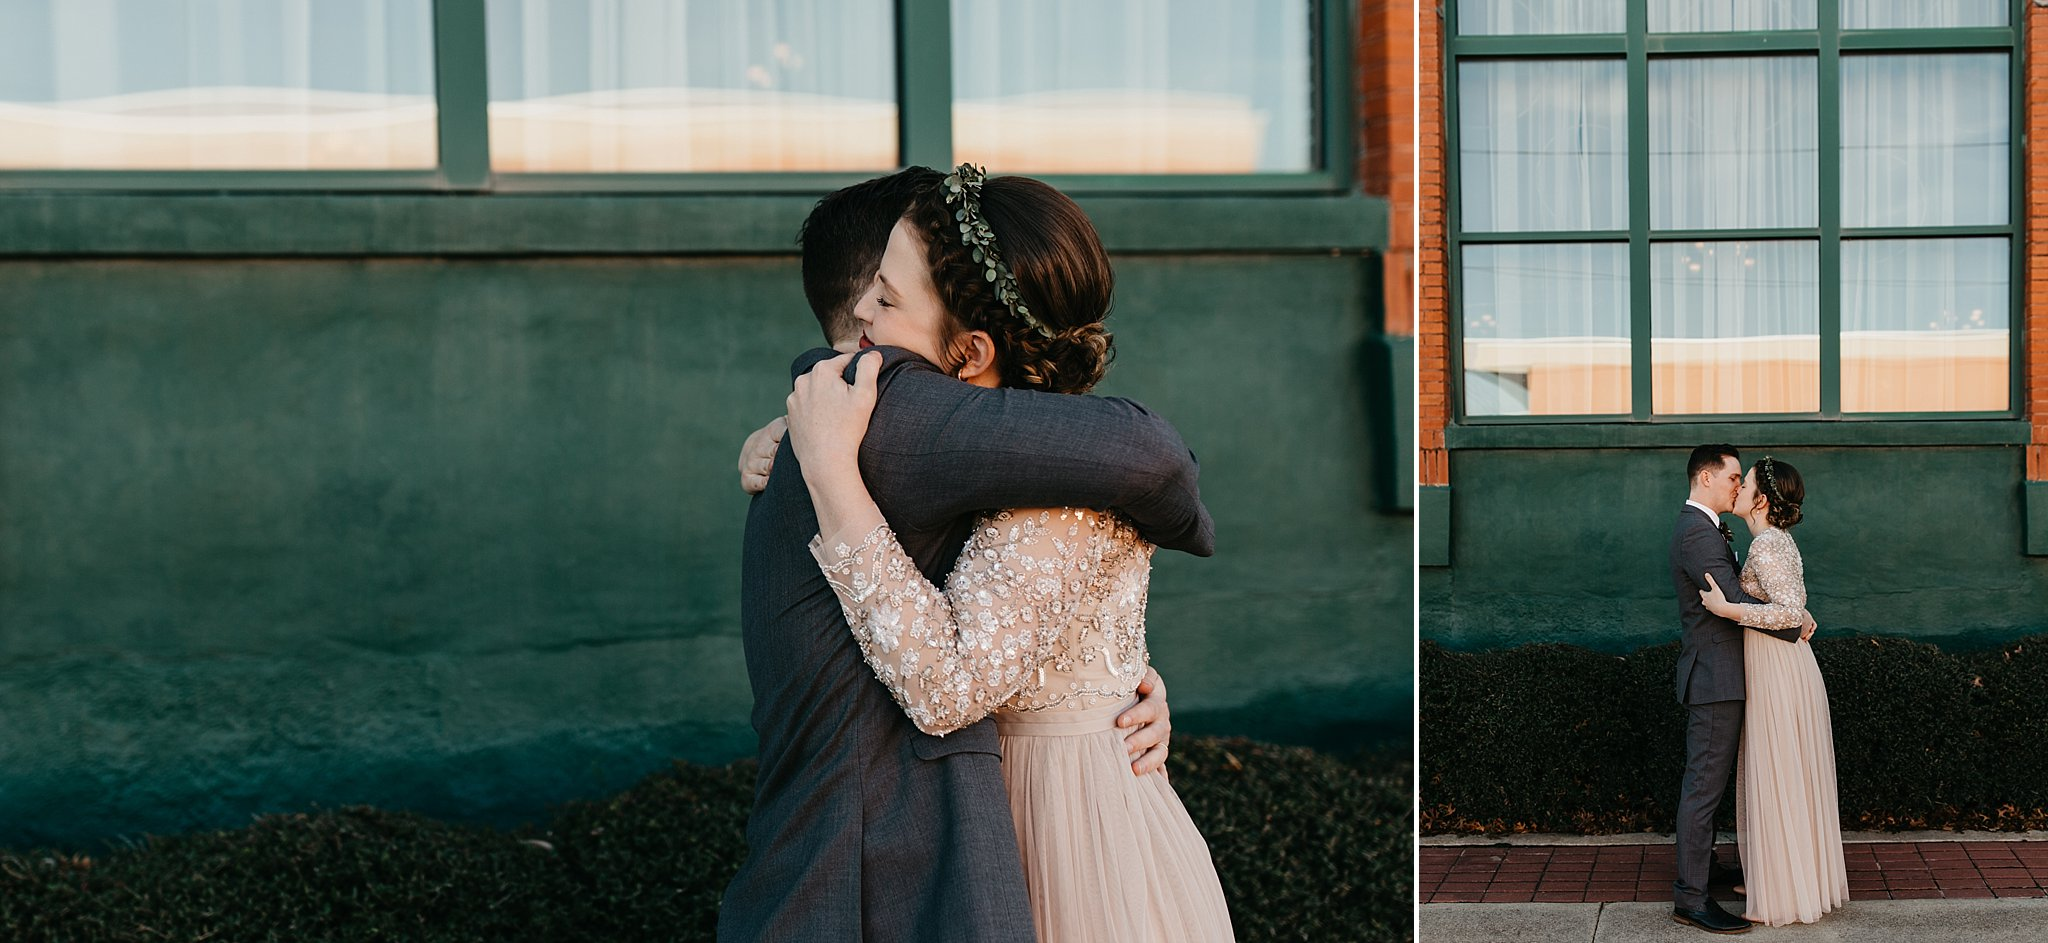 Wilderlove Co_Waco Texas_The Phoenix_Romantic Wedding Photography_0025.jpg